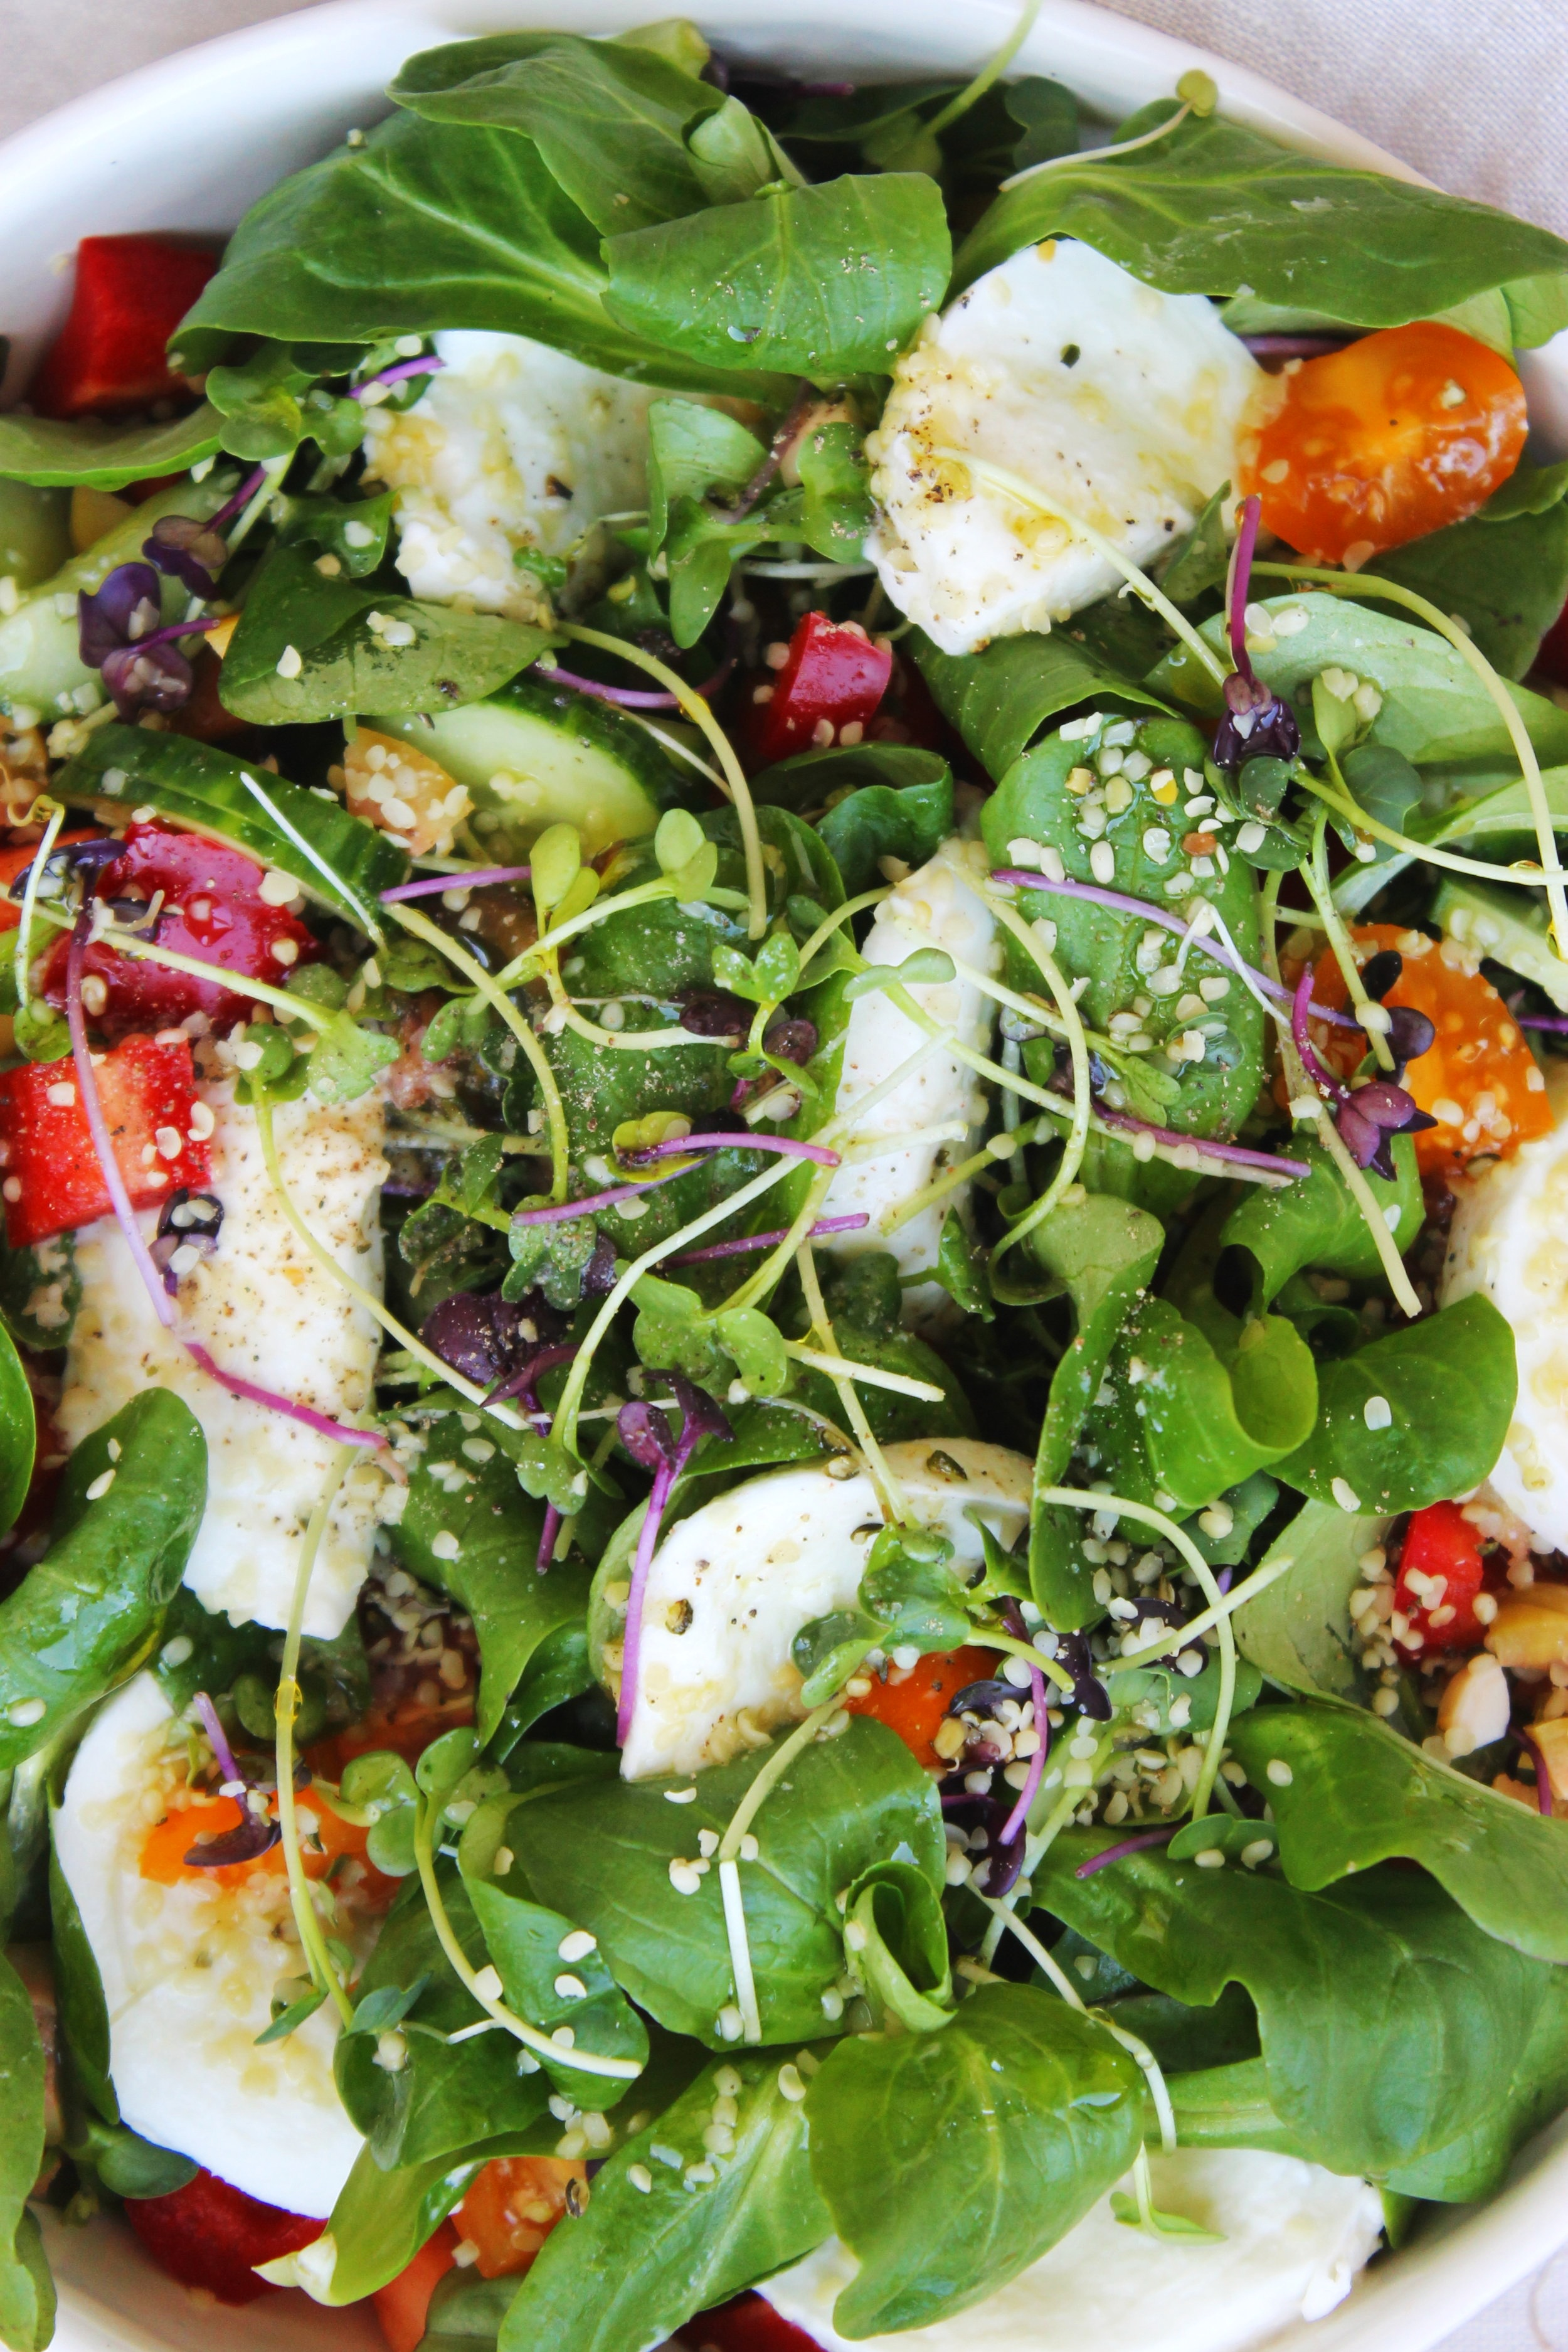 Garden mozzarella di bufala salad | Beloved Kitchen